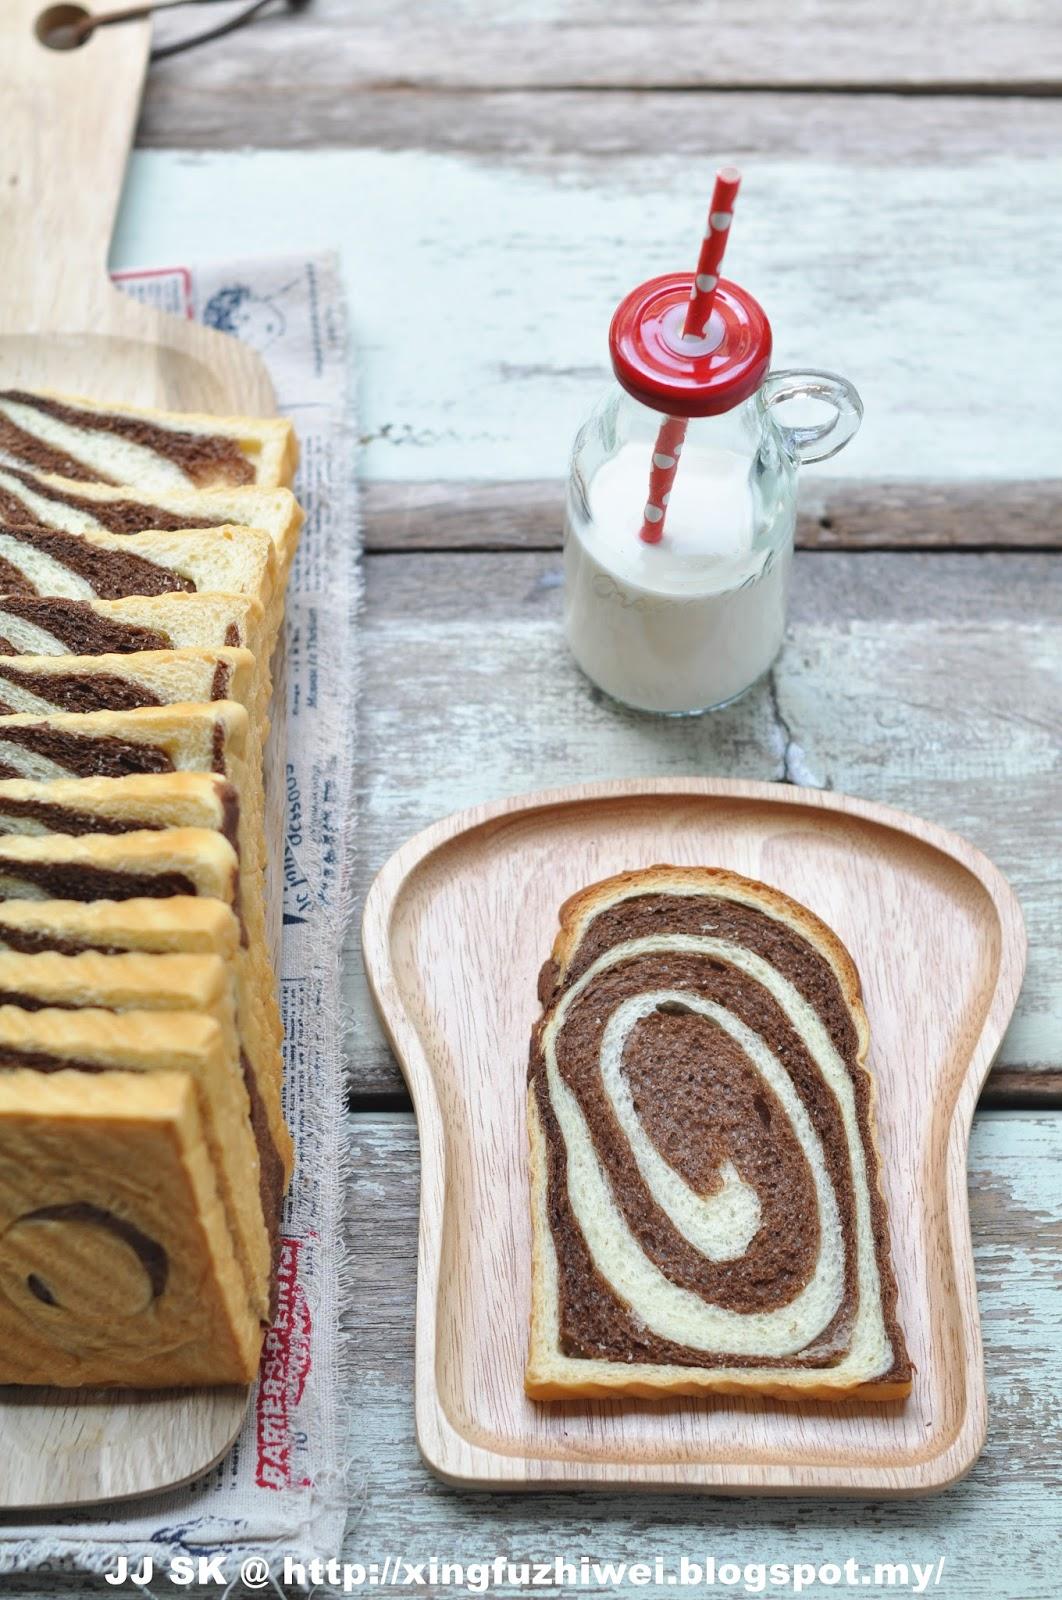 two tone kitchen table with high chairs 爱厨房的幸福之味: 日式超软双色吐司 (低温发酵32小时) japanese super soft toast ...